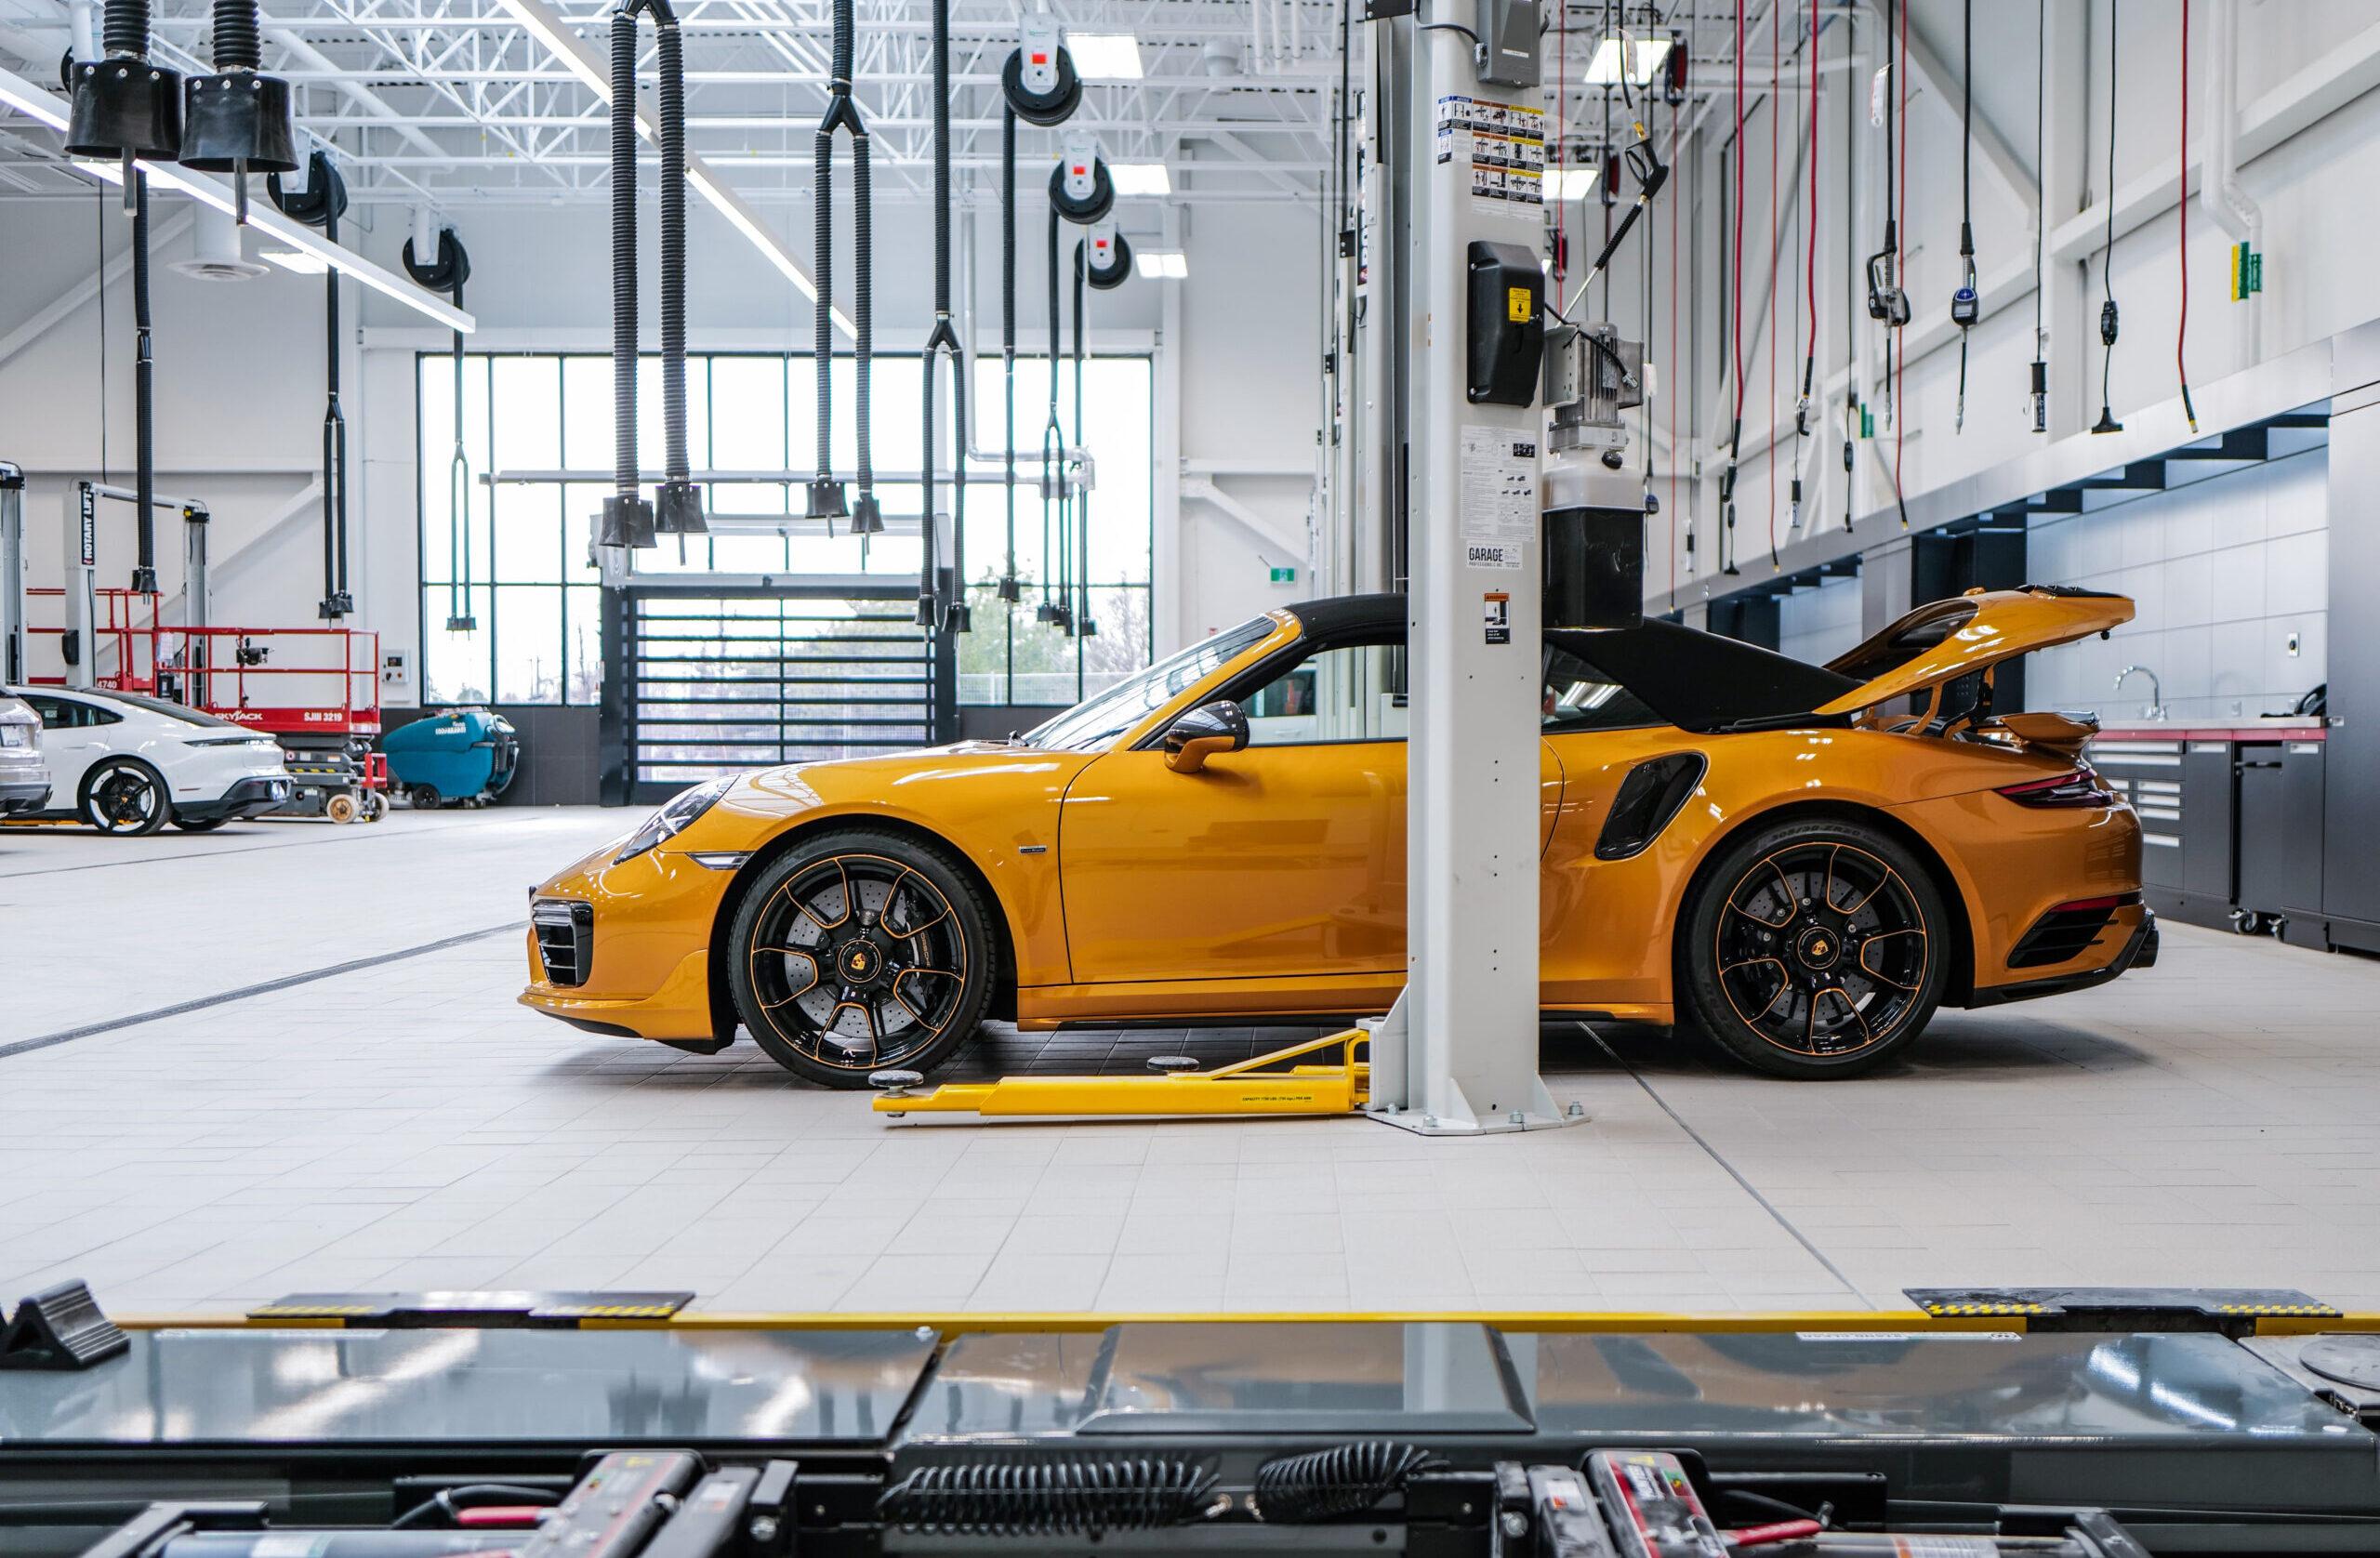 Porsche Centre Markham service centre yellow Porsche